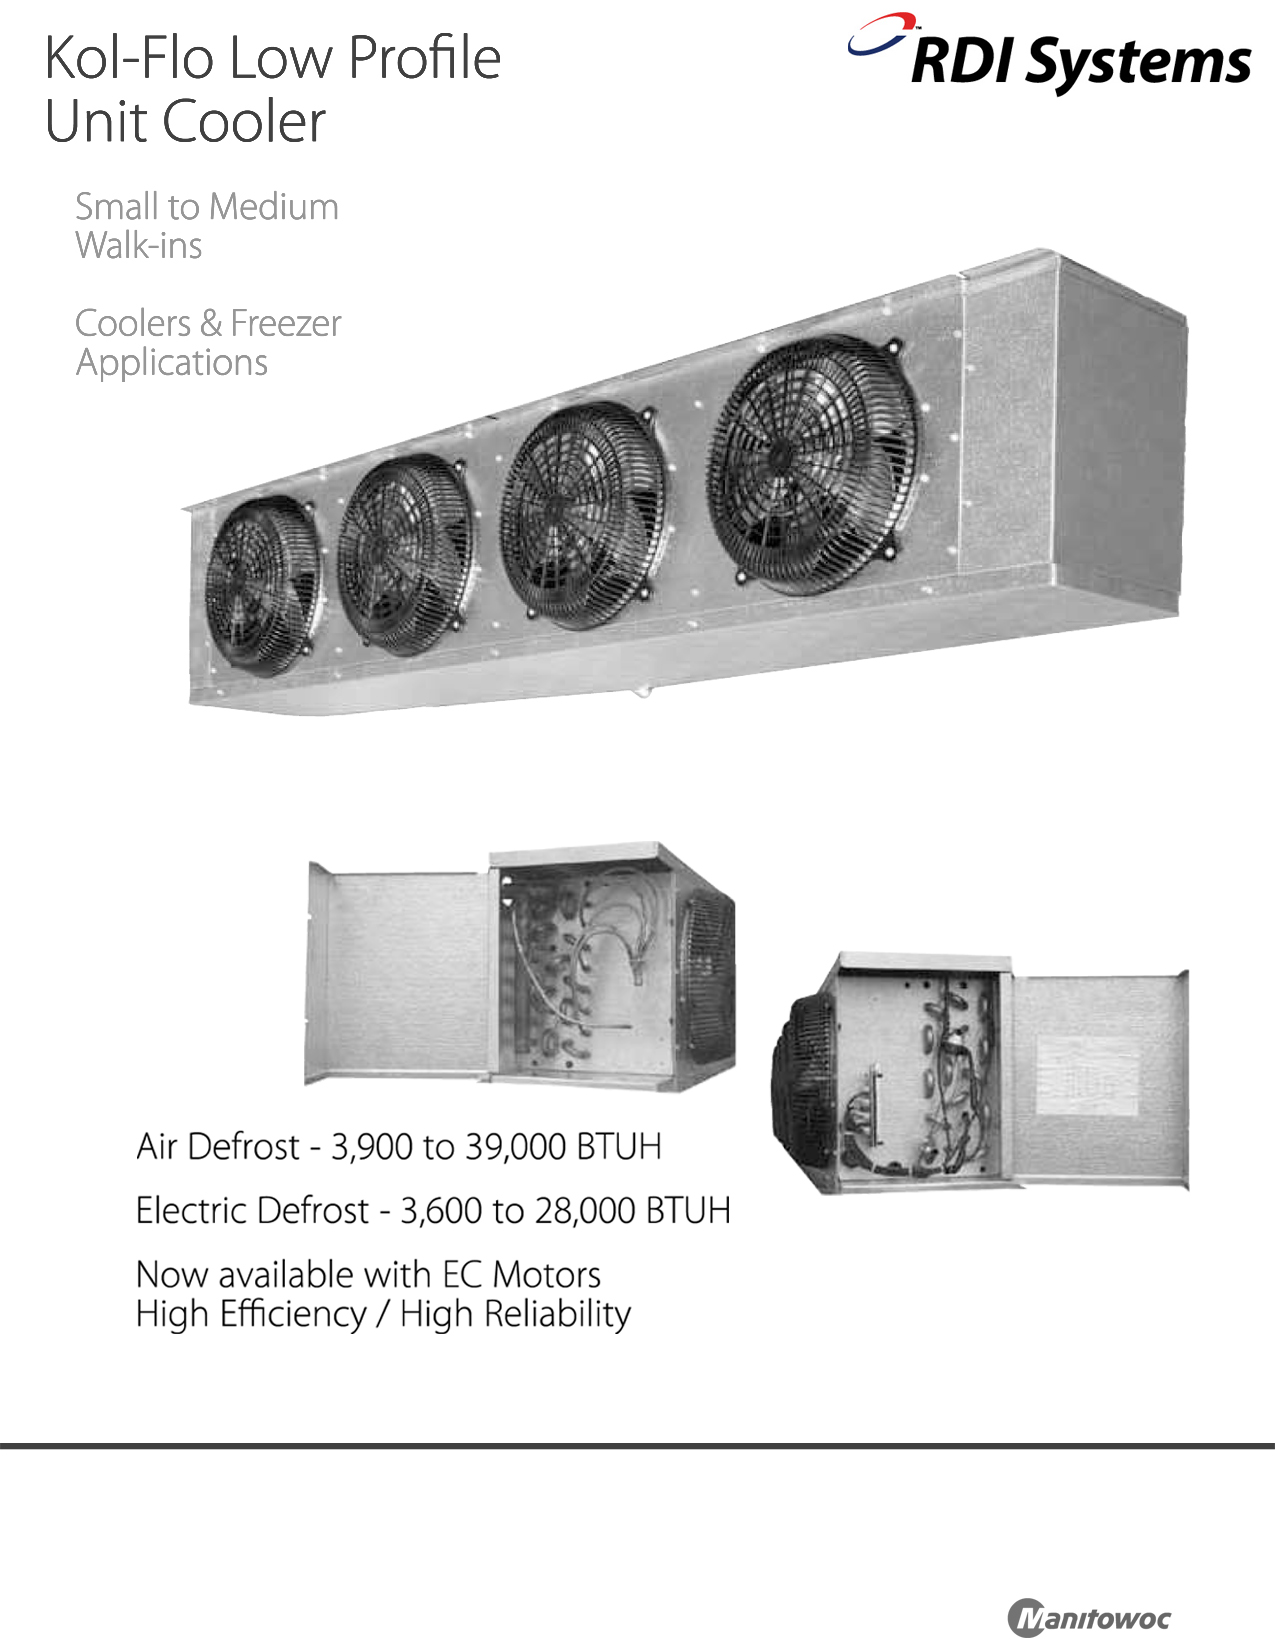 Rdi Refrigeration Systems Kol